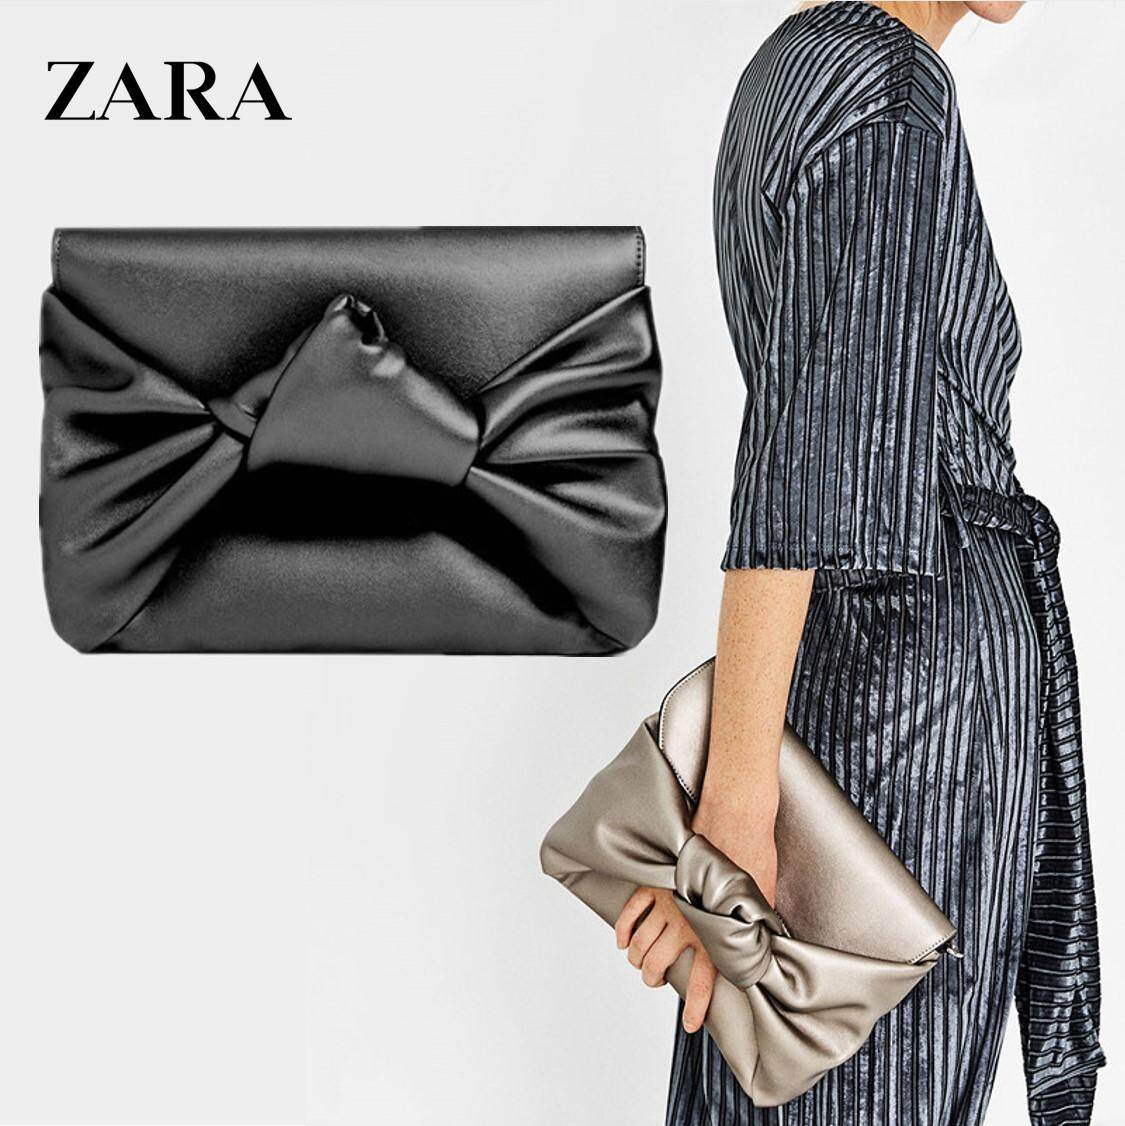 b56e3f645f854 Zara Malaysia Products at Best Price | Lazada